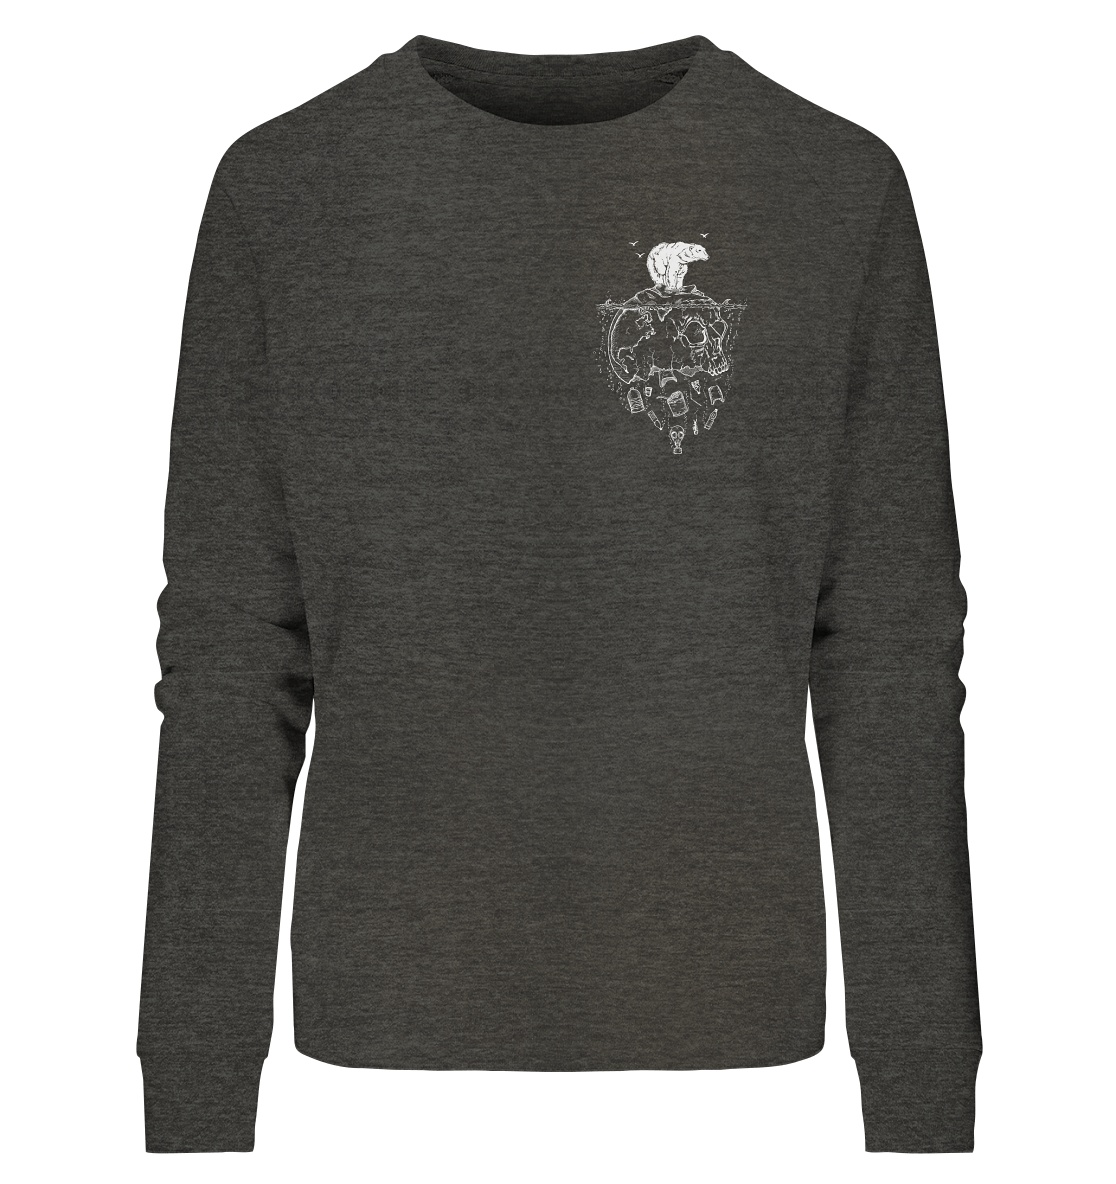 front-ladies-organic-sweatshirt-252625-1116x-16.png